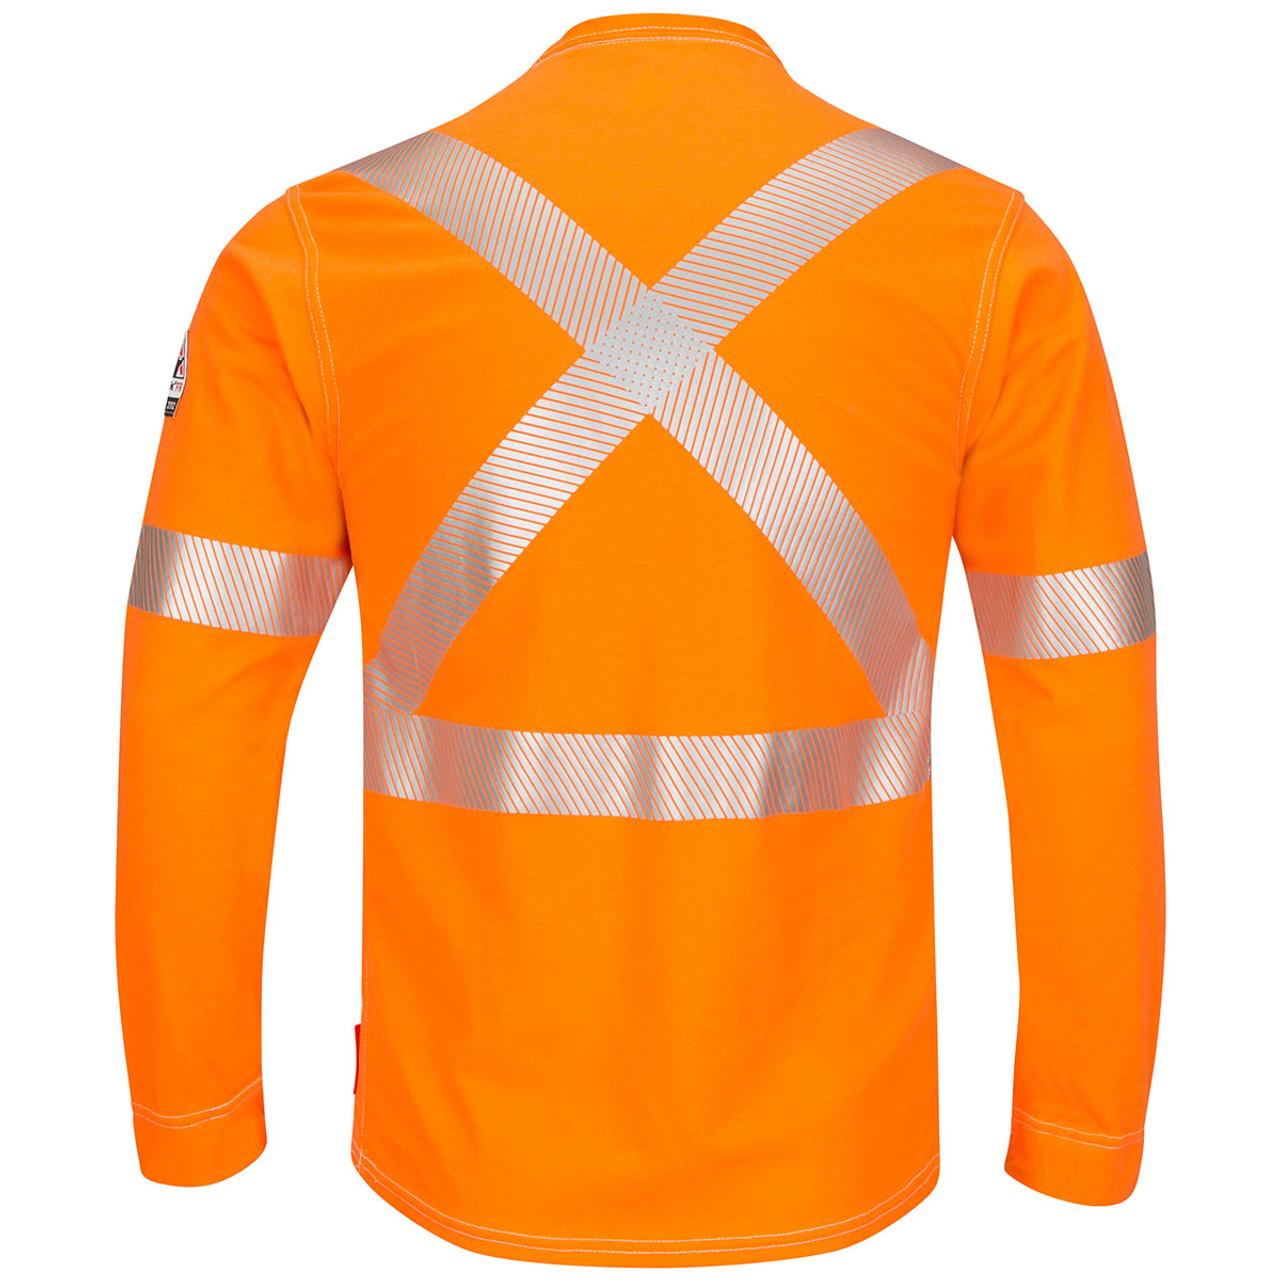 62a87fc01b7 Bulwark FR X-Back iQ Series Comfort Knit Long Sleeve T-Shirt QT34 Back